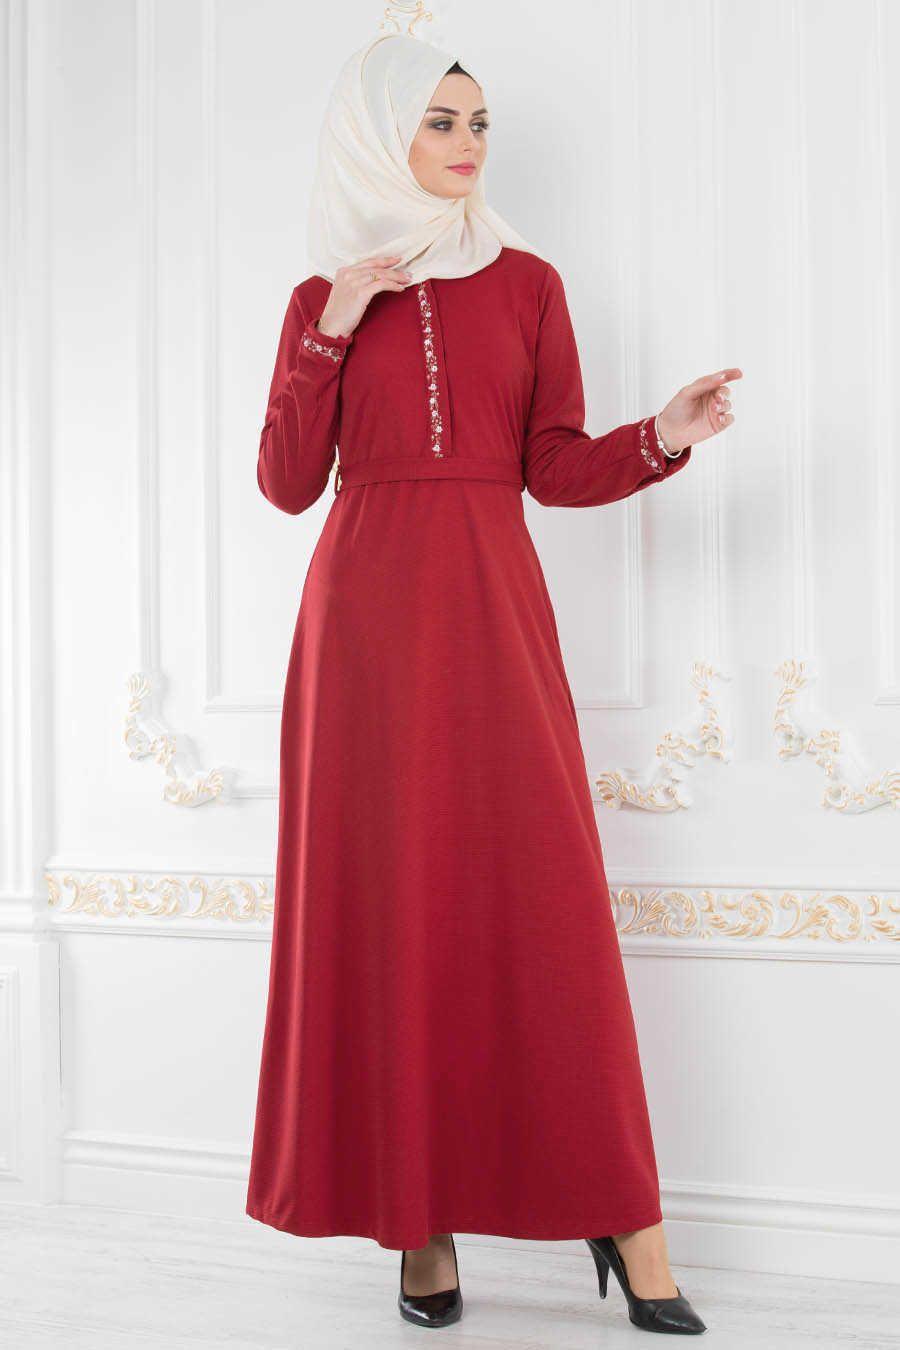 Kemerli Kirmizi Tesettur Elbise 8219k Neva Style Com Daily Dress Muslimah Fashion Muslim Fashion